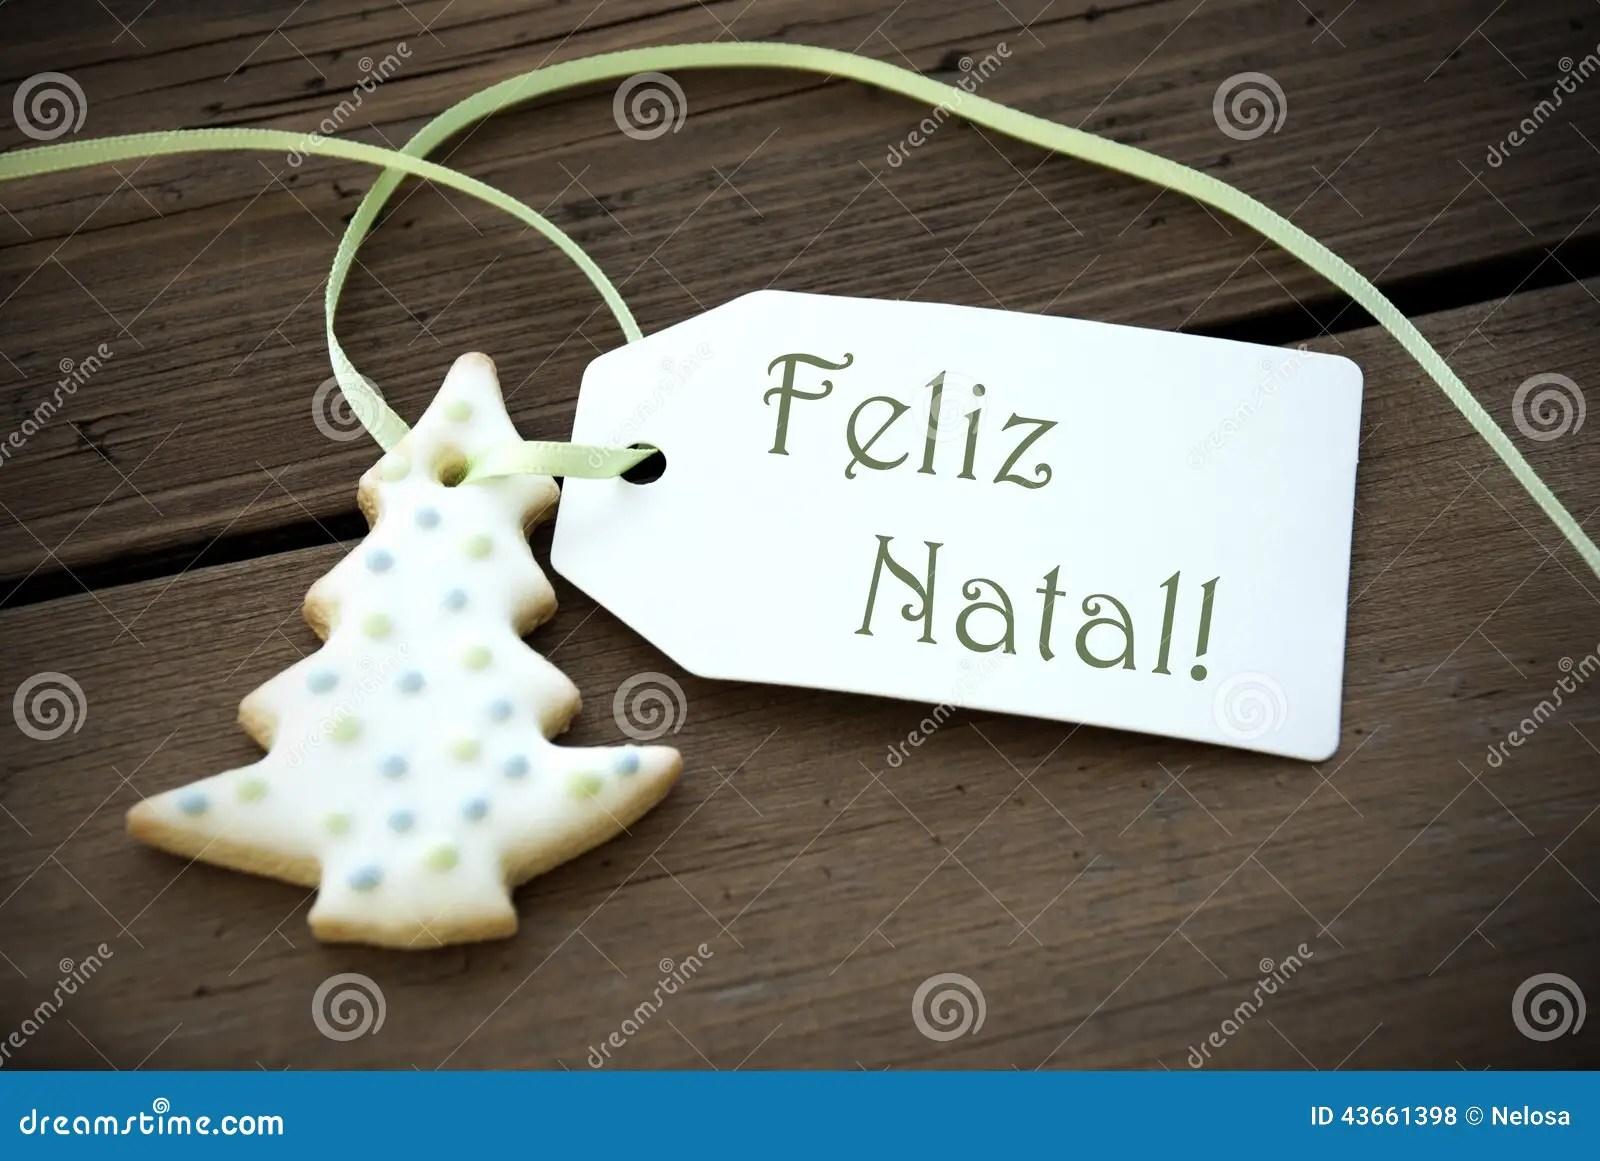 Christmas Label With Feliz Natal Stock Photo Image 43661398